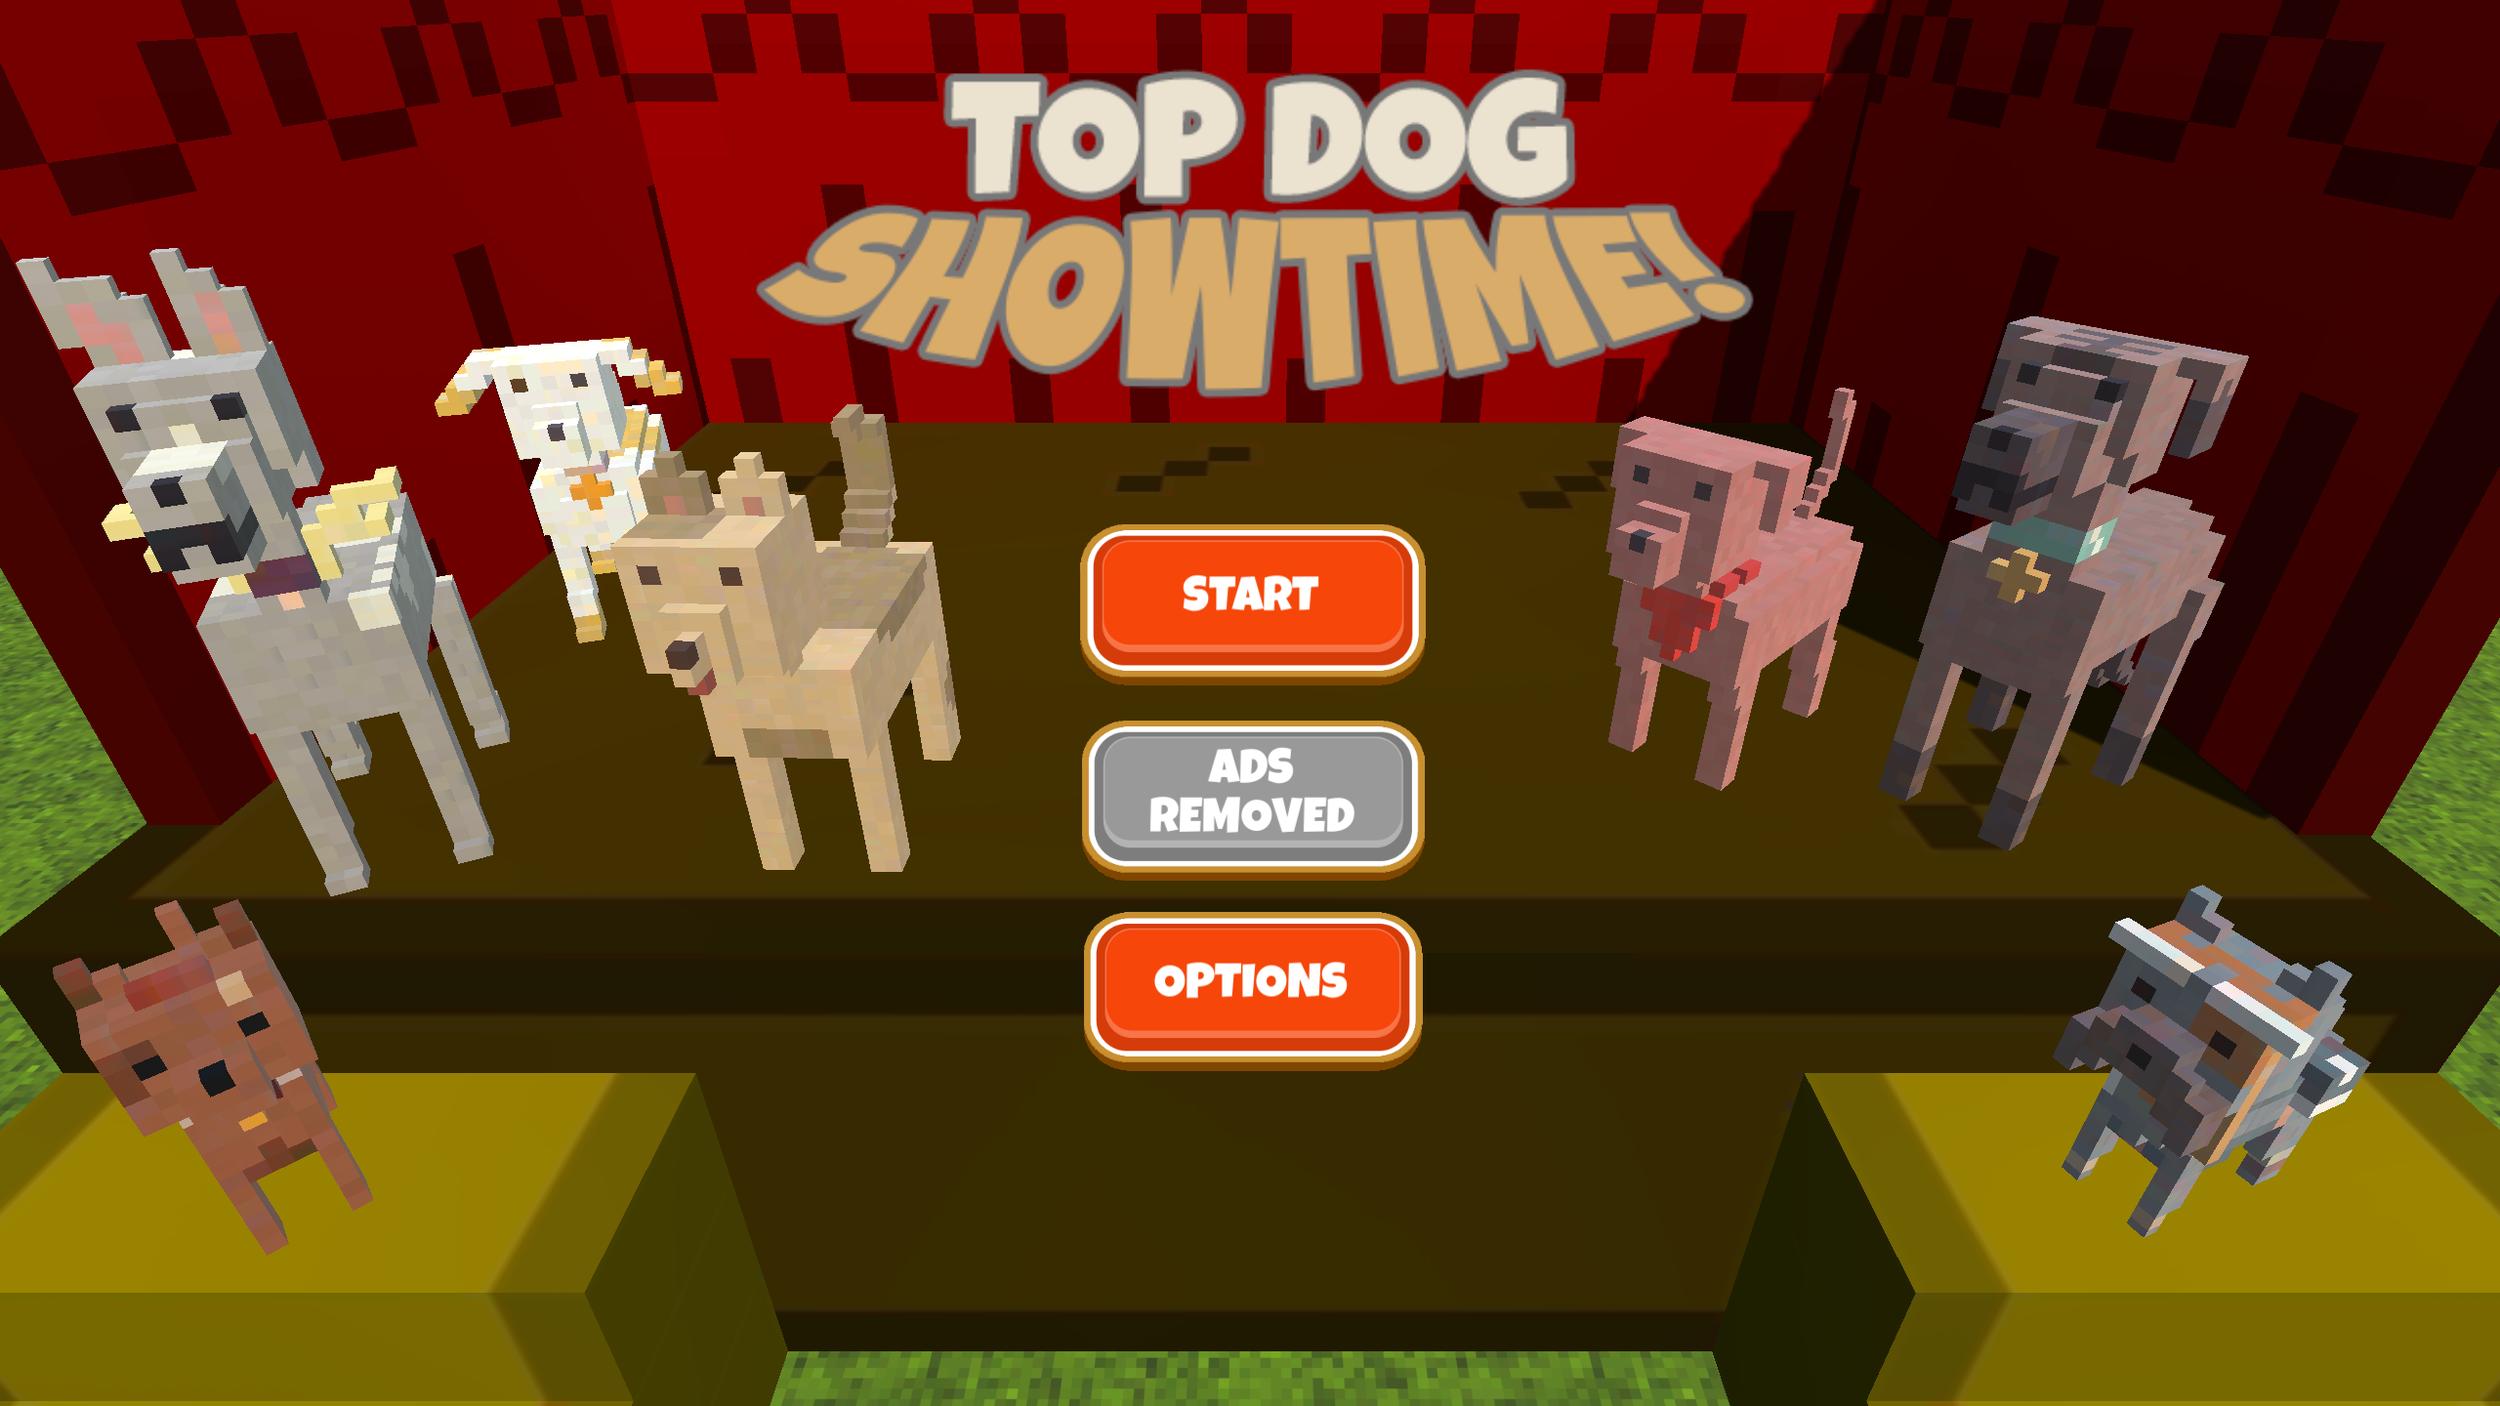 TD Showtime Screenshot Start Menu.png